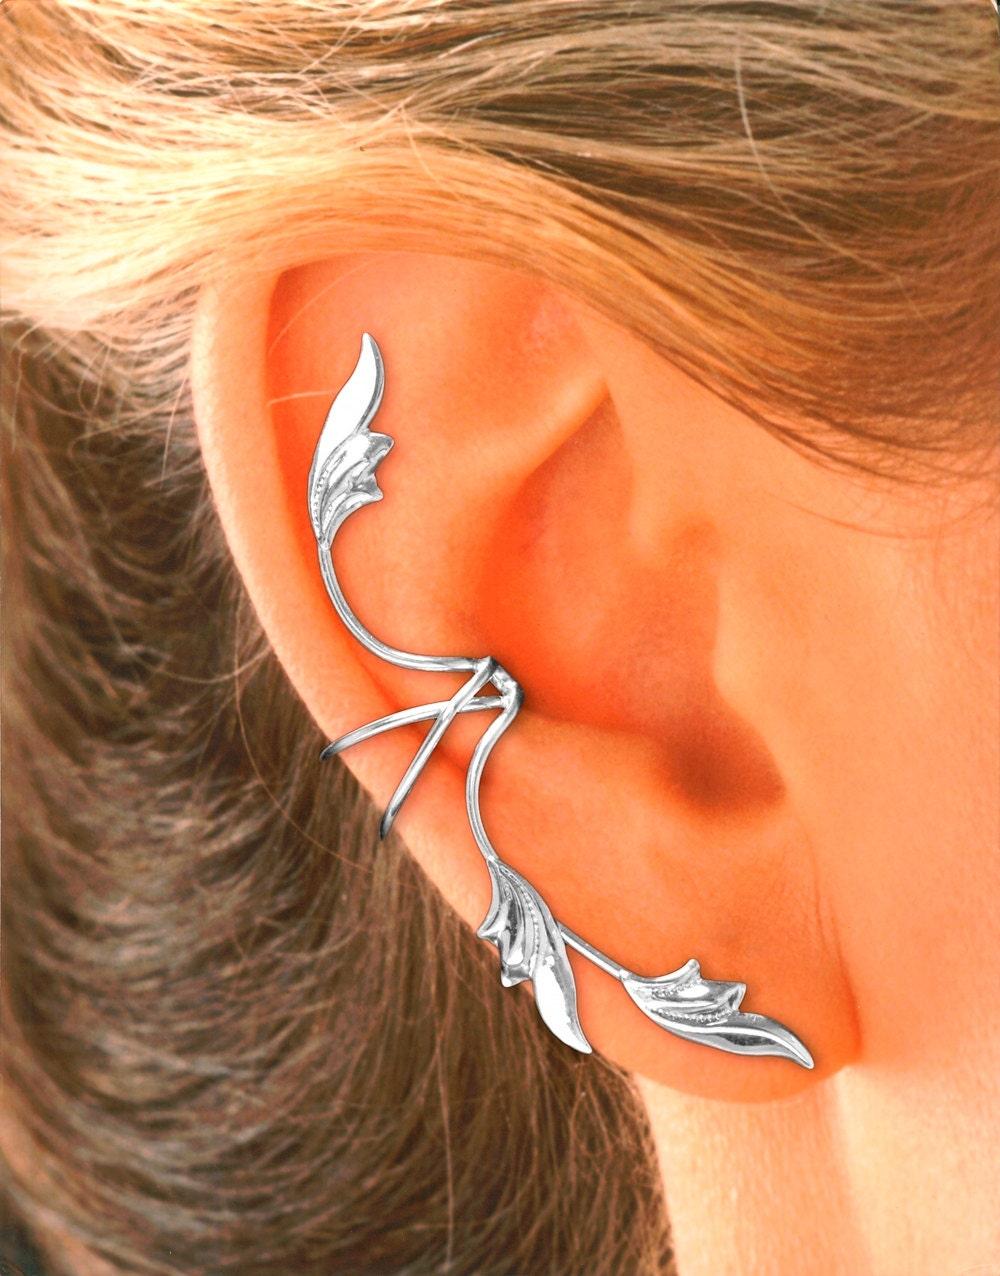 full ear 3 leaf non pierced ear cuff in sterling silver or. Black Bedroom Furniture Sets. Home Design Ideas